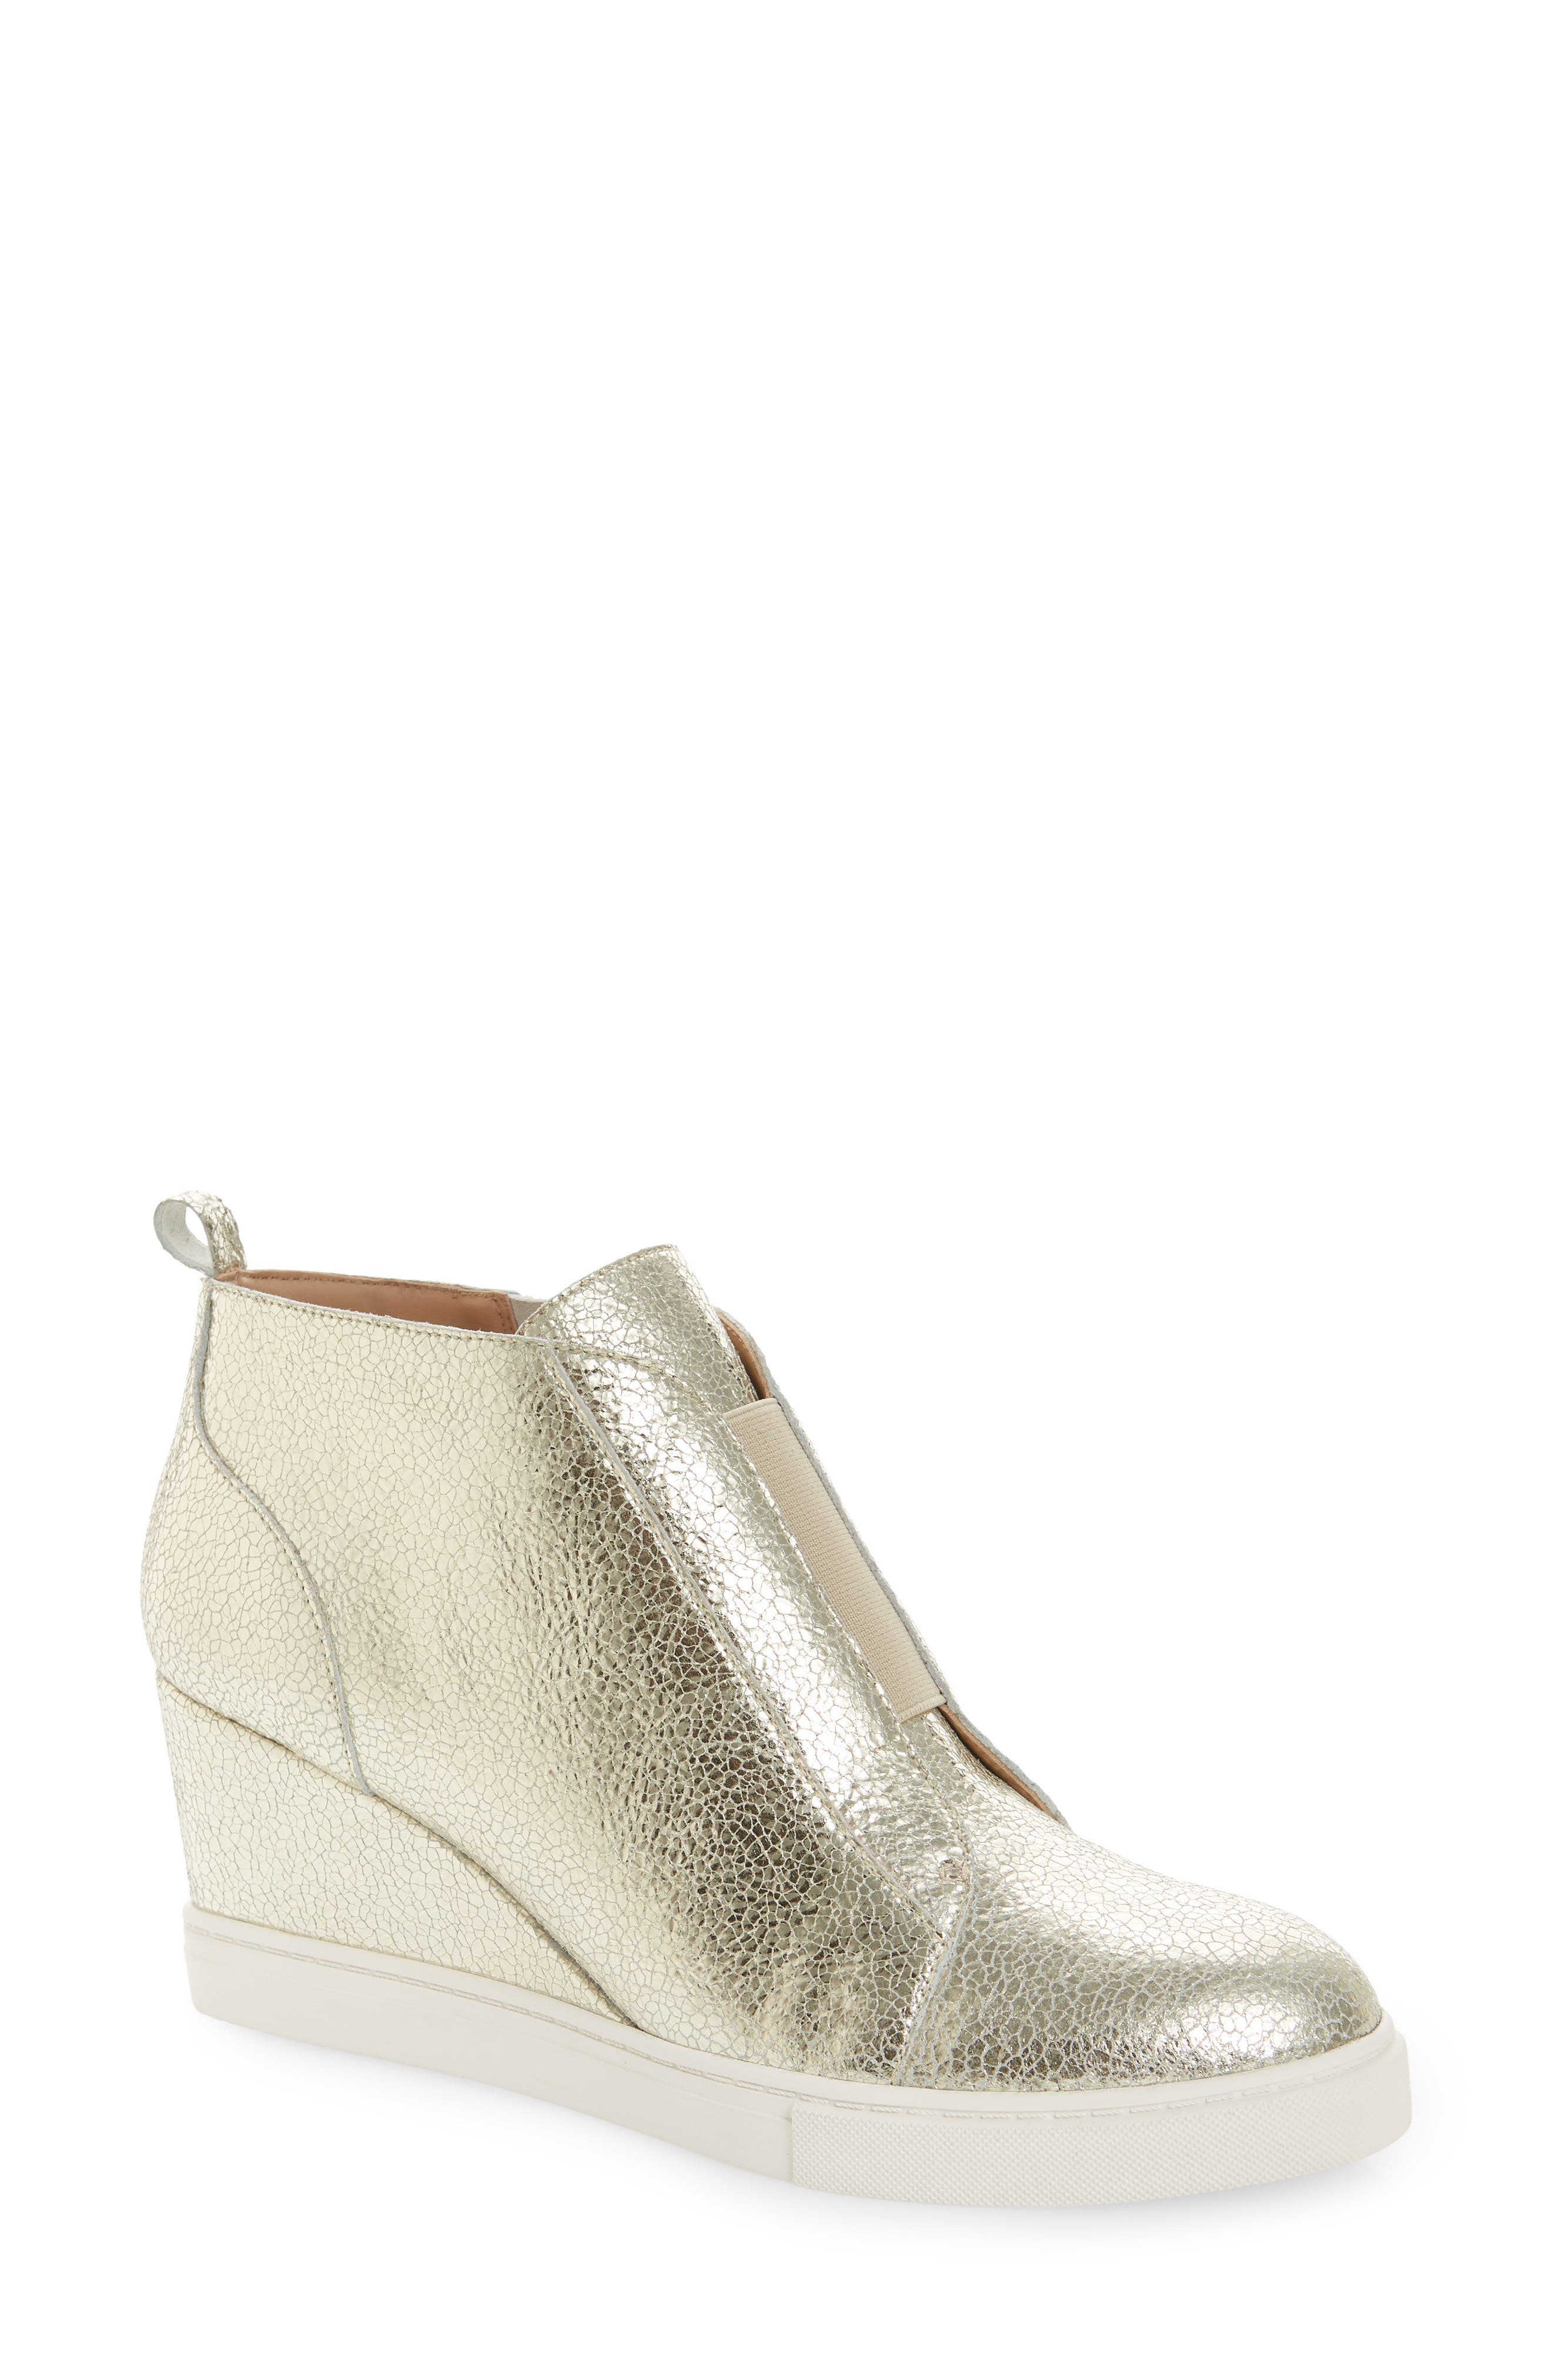 2ff625b45b43 Shoe Steals  Women s Linea Paolo Wedges